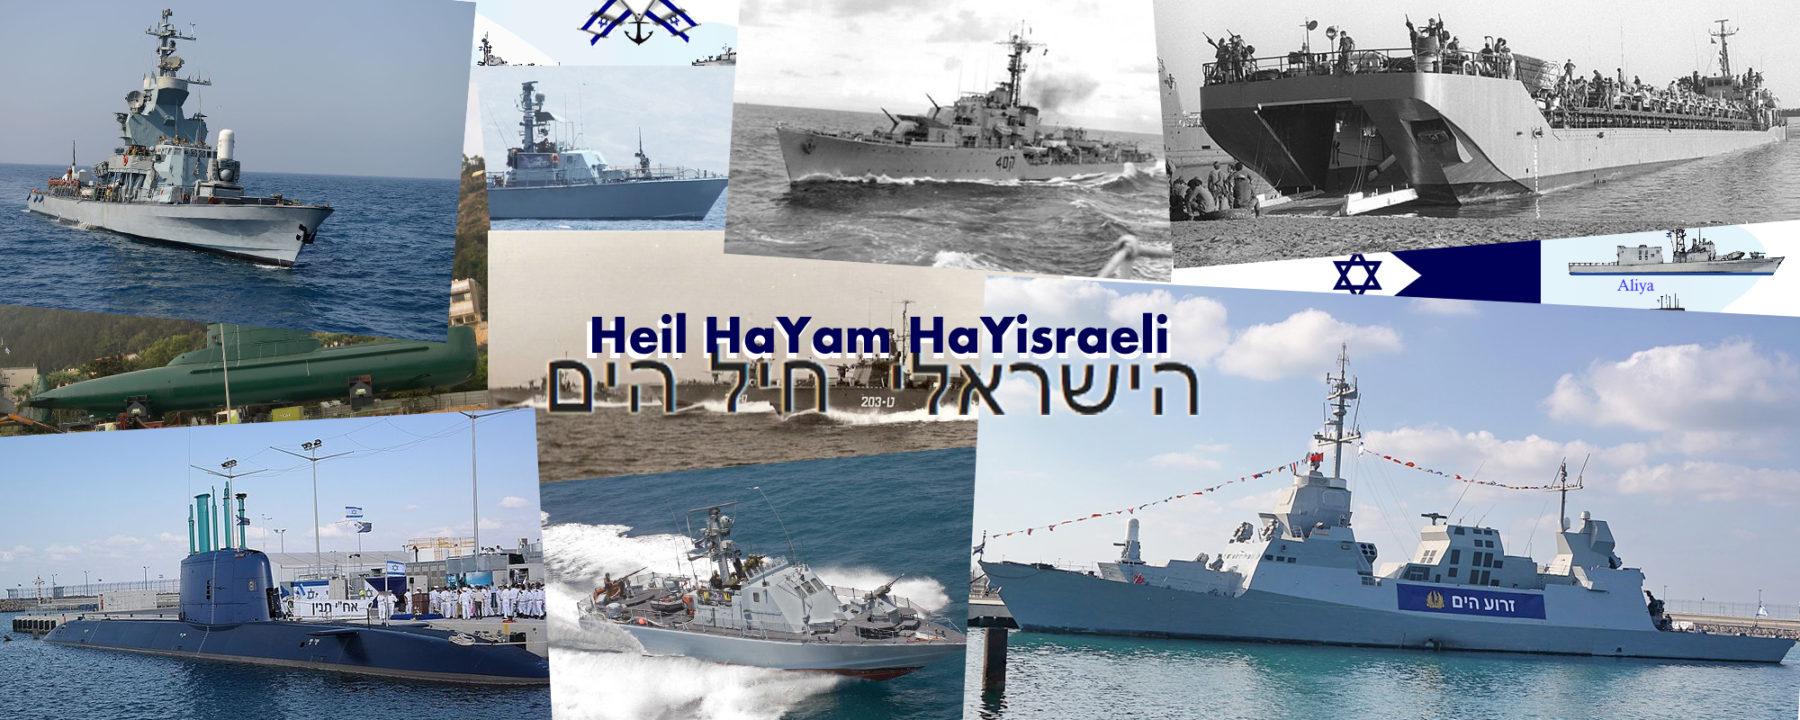 Heil Ha Yam - The Israeli Navy